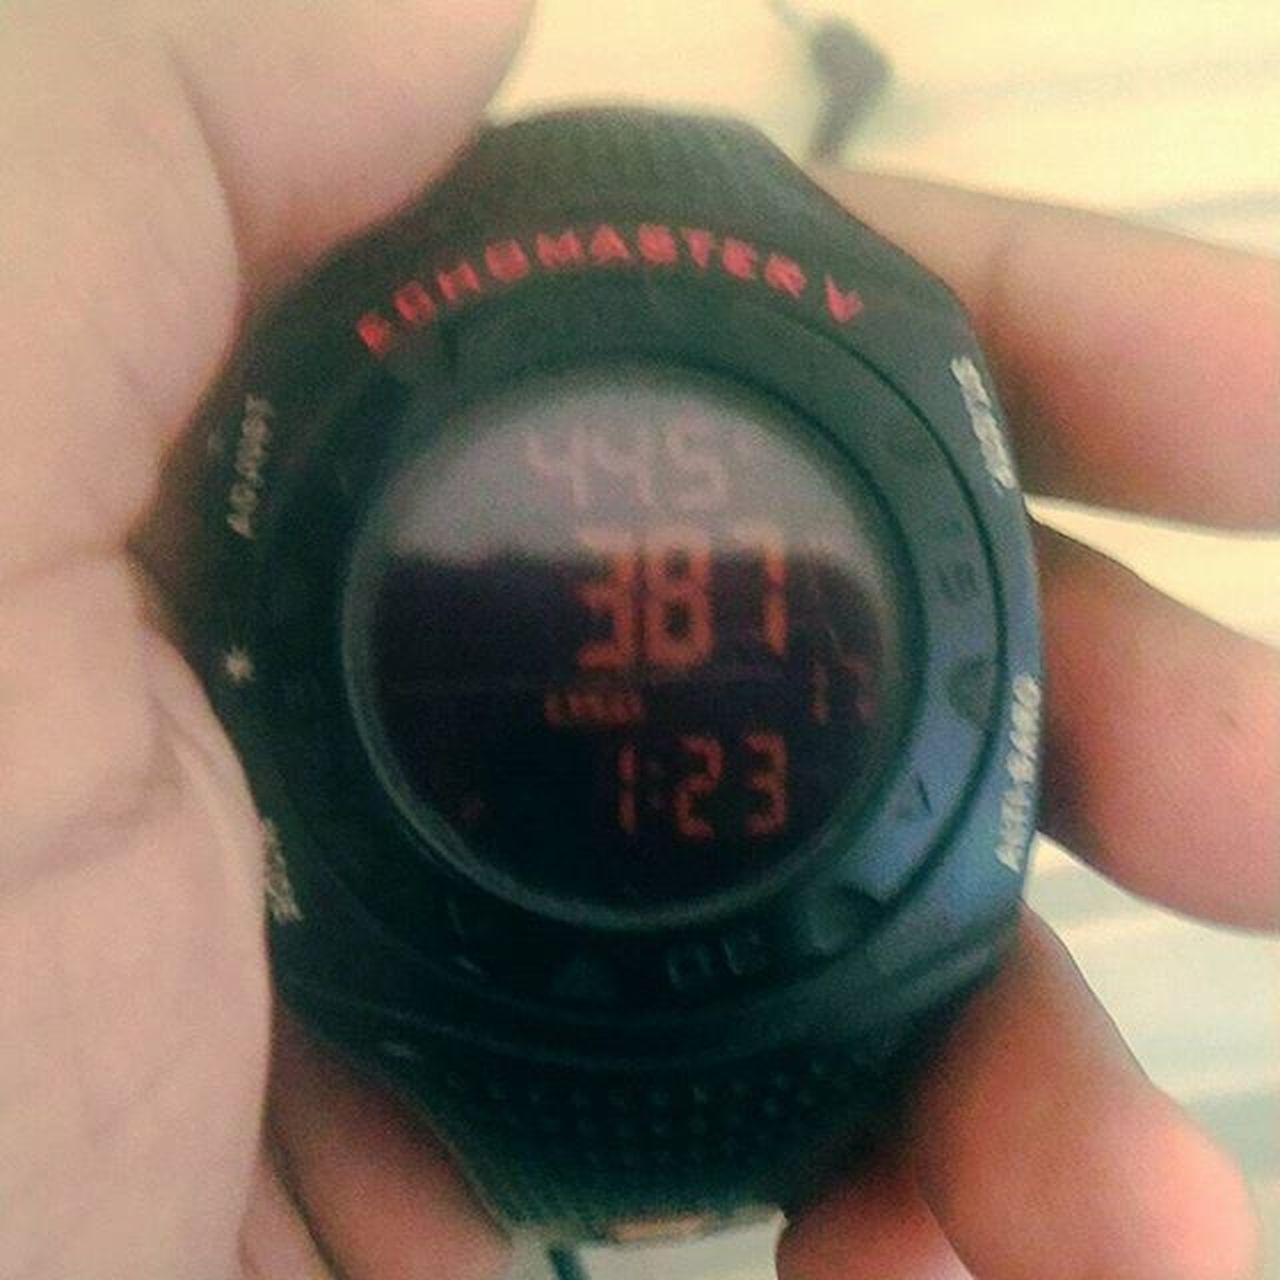 Freaken hot at Coimbatore 45°c Hotsunnyday Weather Coimbatore Hostel Cruiser Echomaster